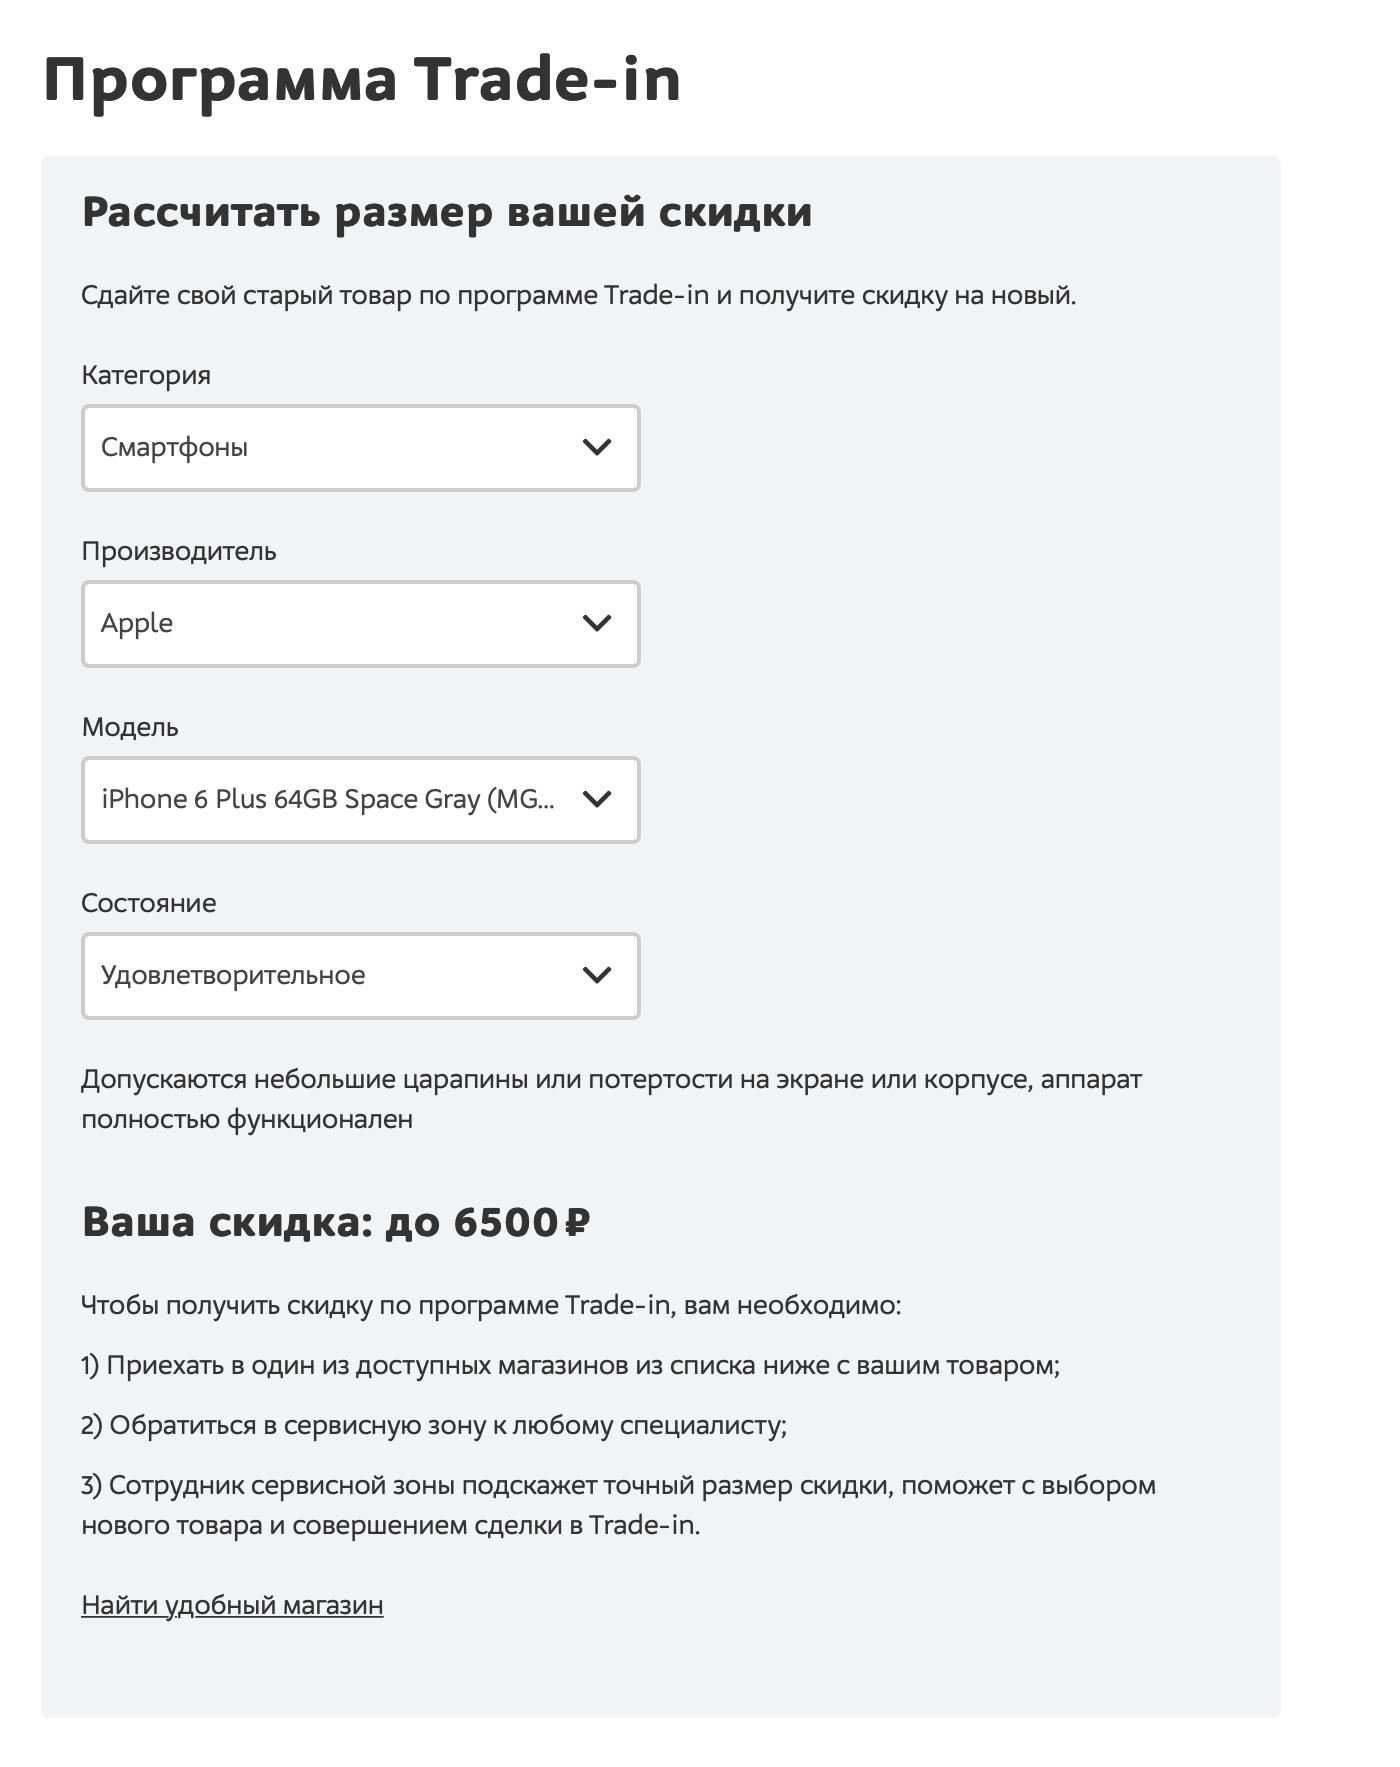 За iPhone 6s 64GB дадут максимум 5100 р. — точную сумму назовет консультант после оценки